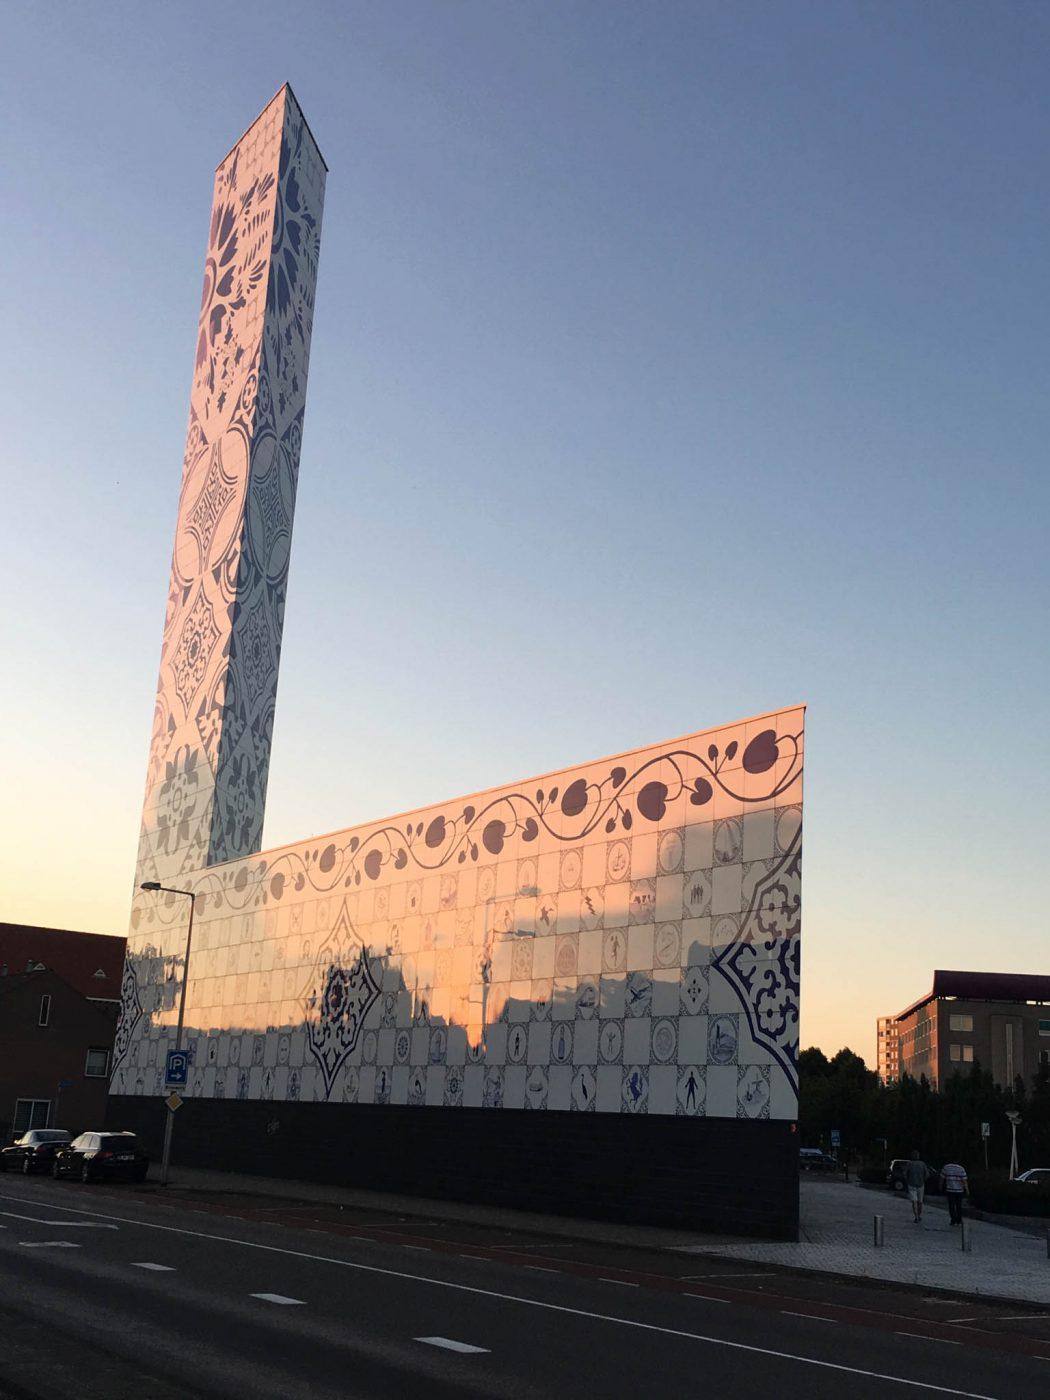 Dutch Design building in Enschede